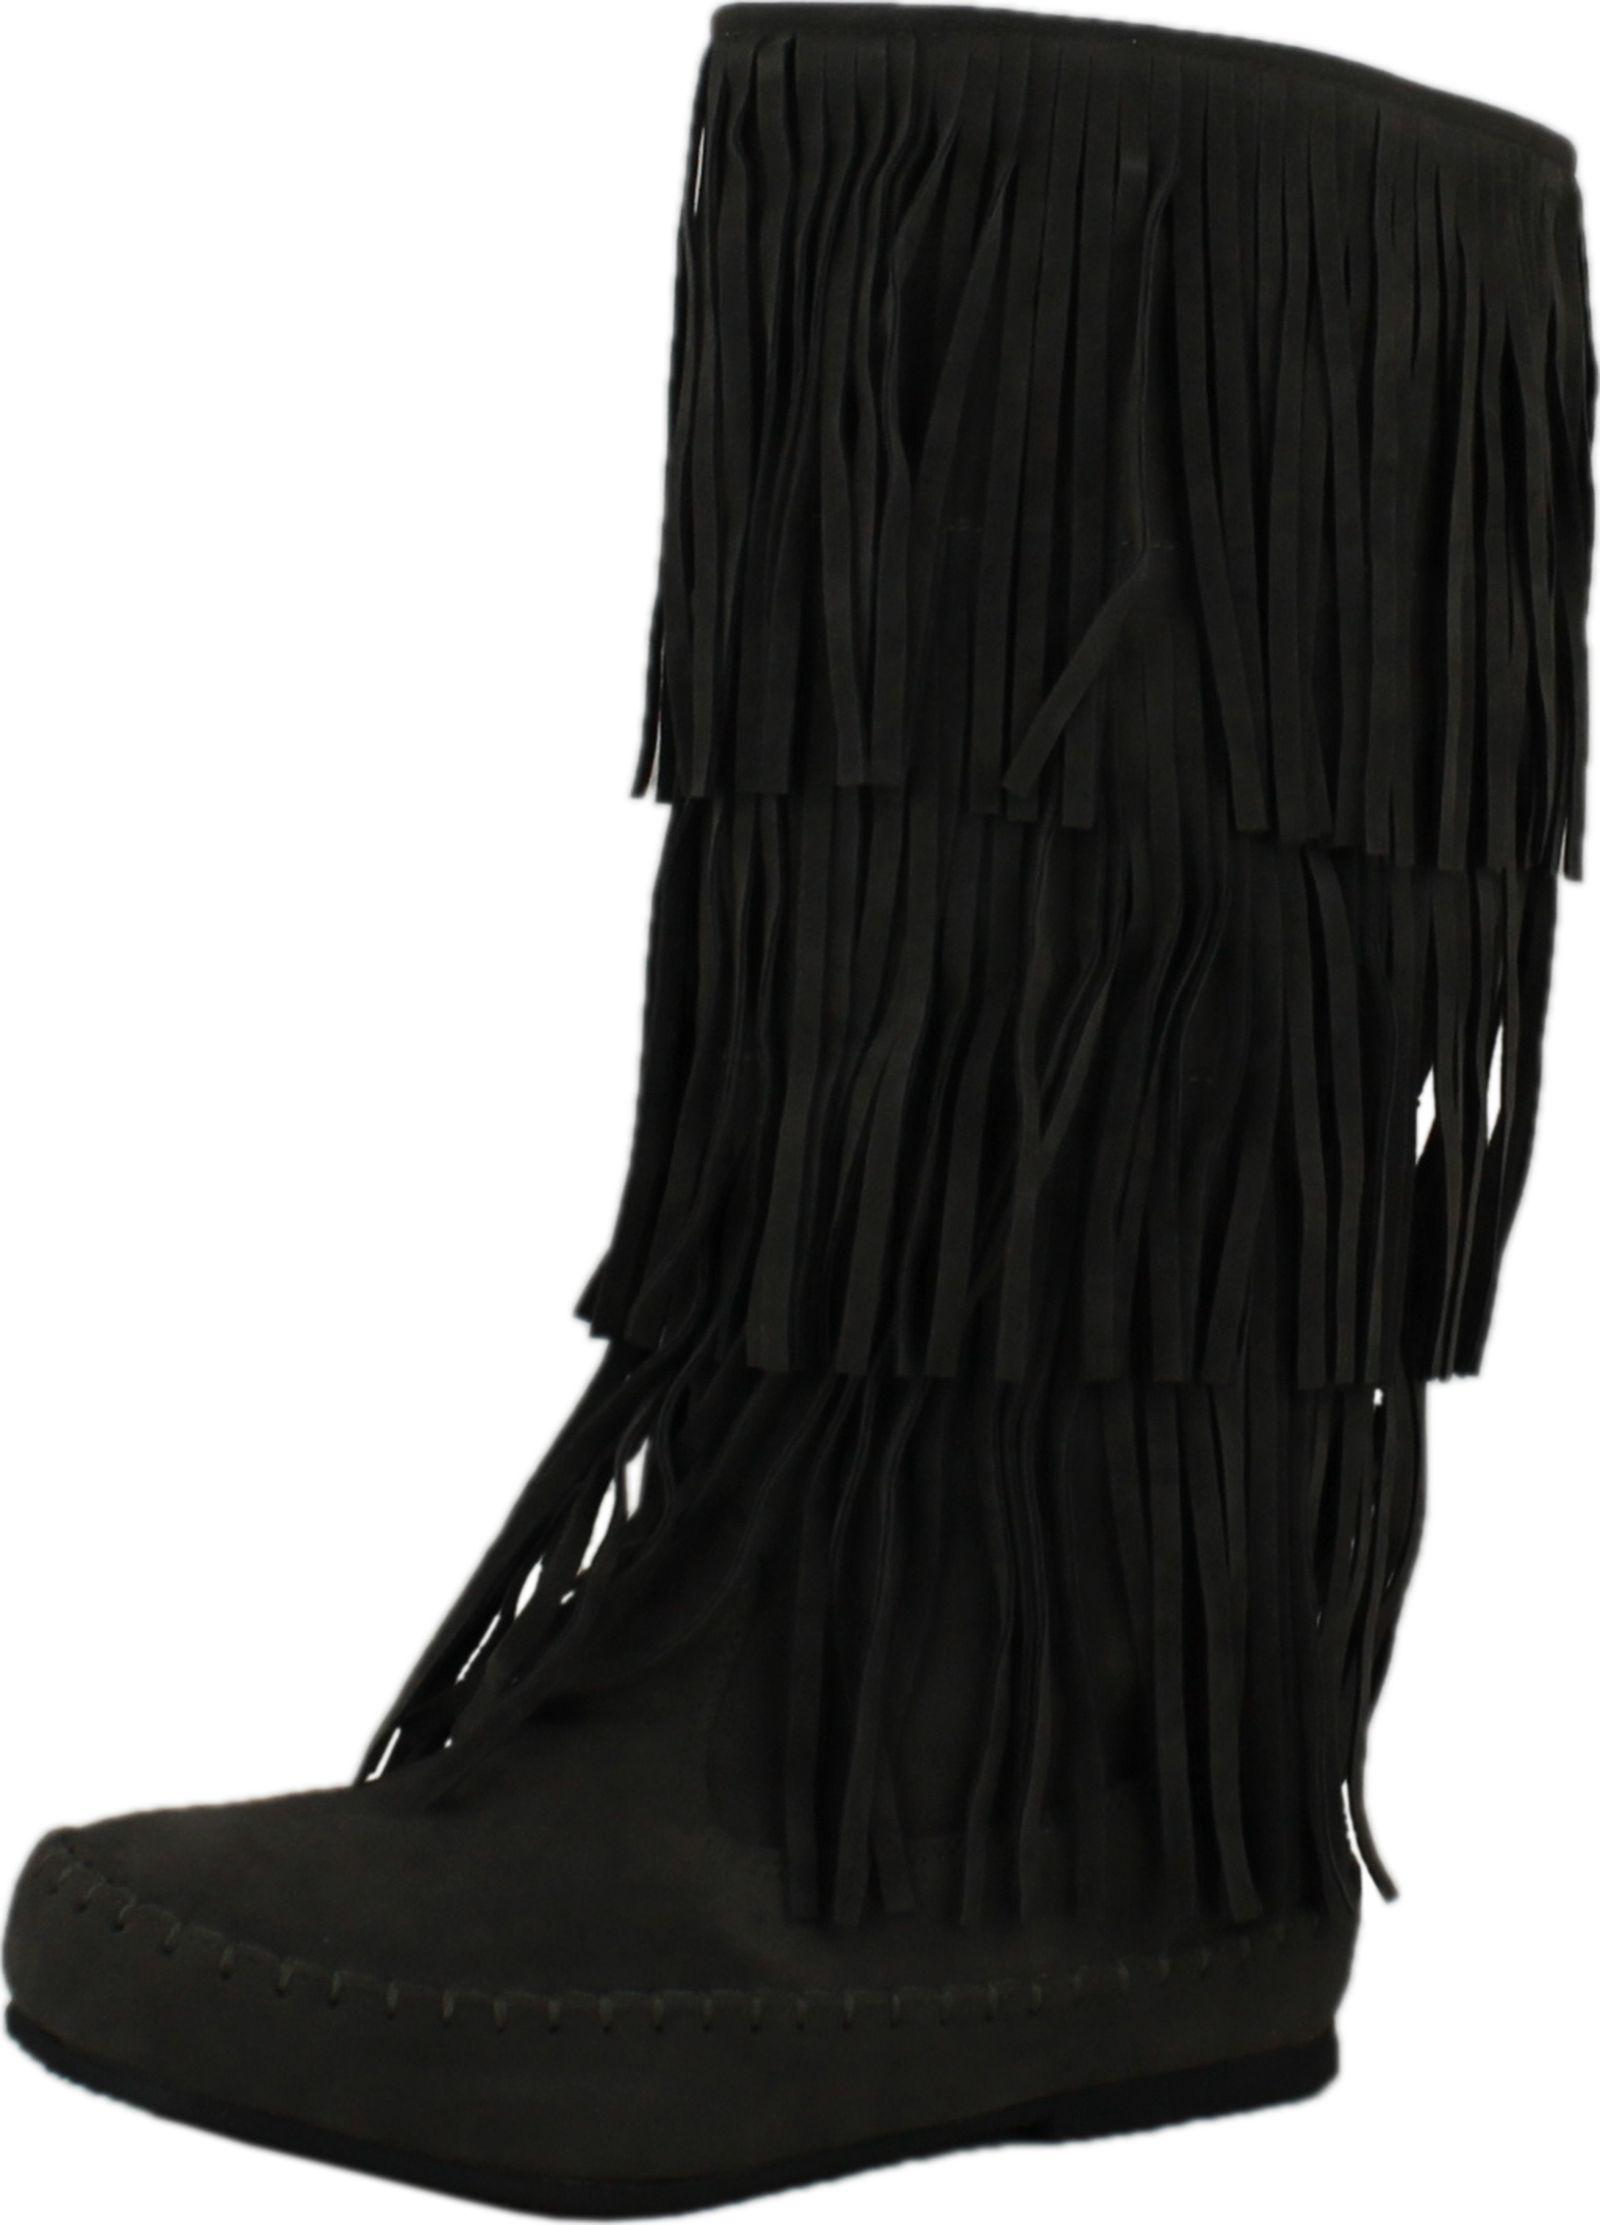 Pierre Dumas Damenschuhe Apache-4 Fringe Moccasin Fashion Stiefel